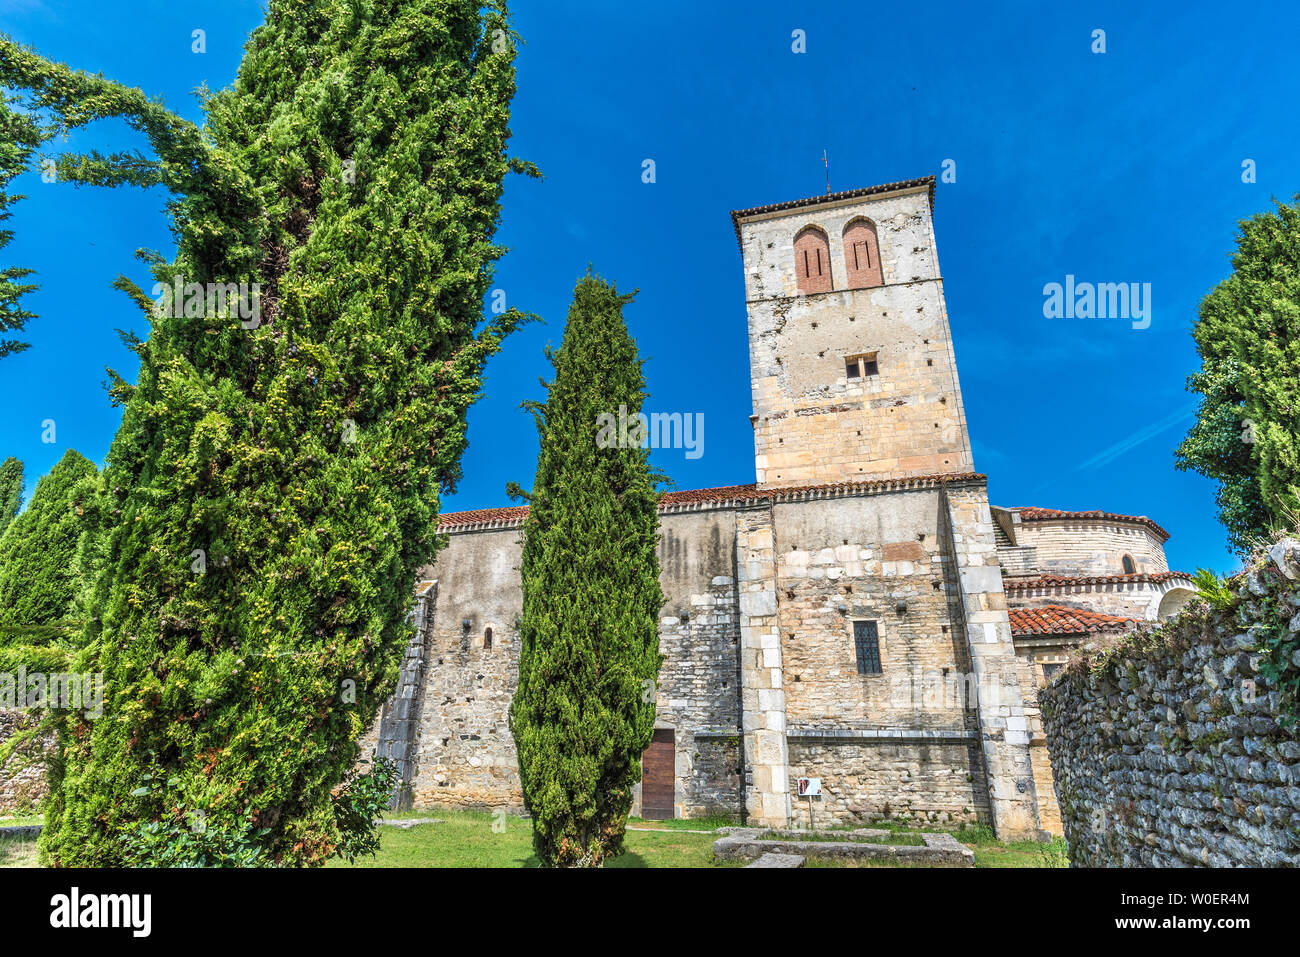 France, Piedmont of the Pyrenees, Haute-Garonne, church St Just de Valcabrère (11th-12th century) Saint James way (UNESCO World Heritage) - Stock Image